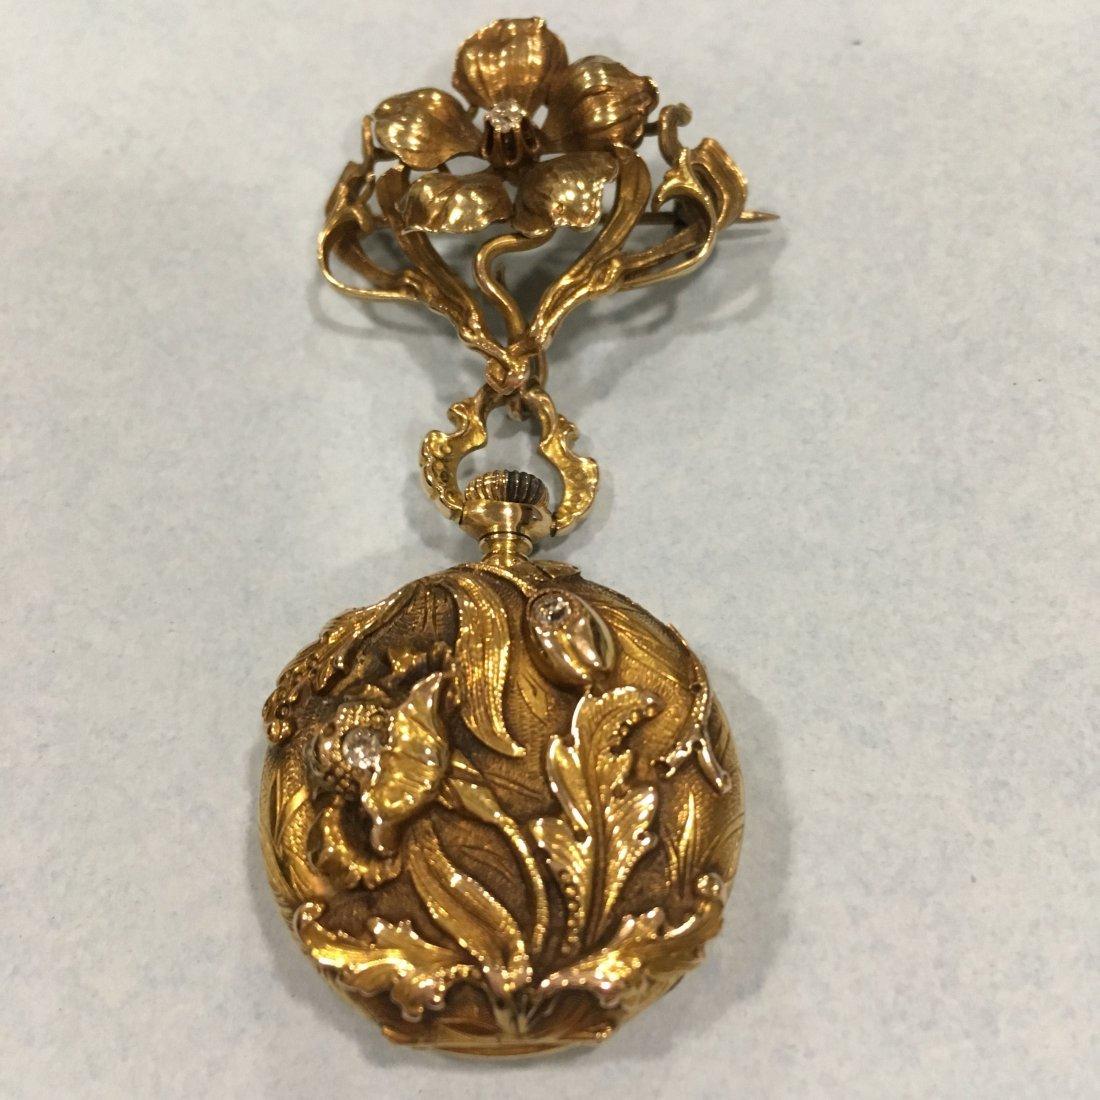 Art Nouveau Lady's 14K Diamond Pendant Watch